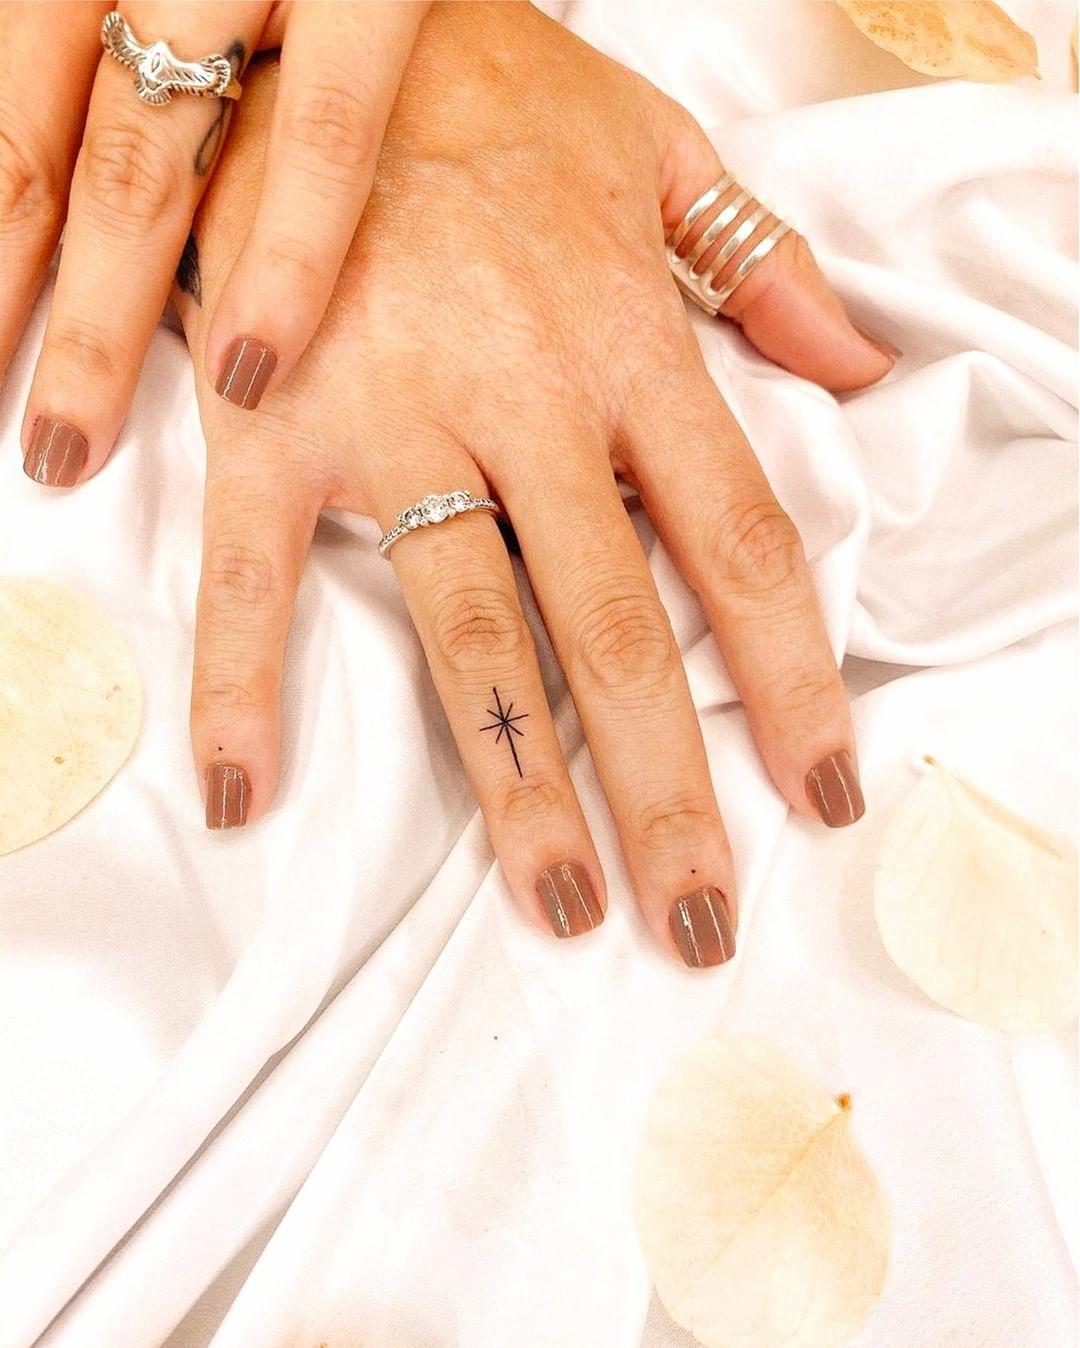 Finger tattoo ideas for females: Minimalistic star